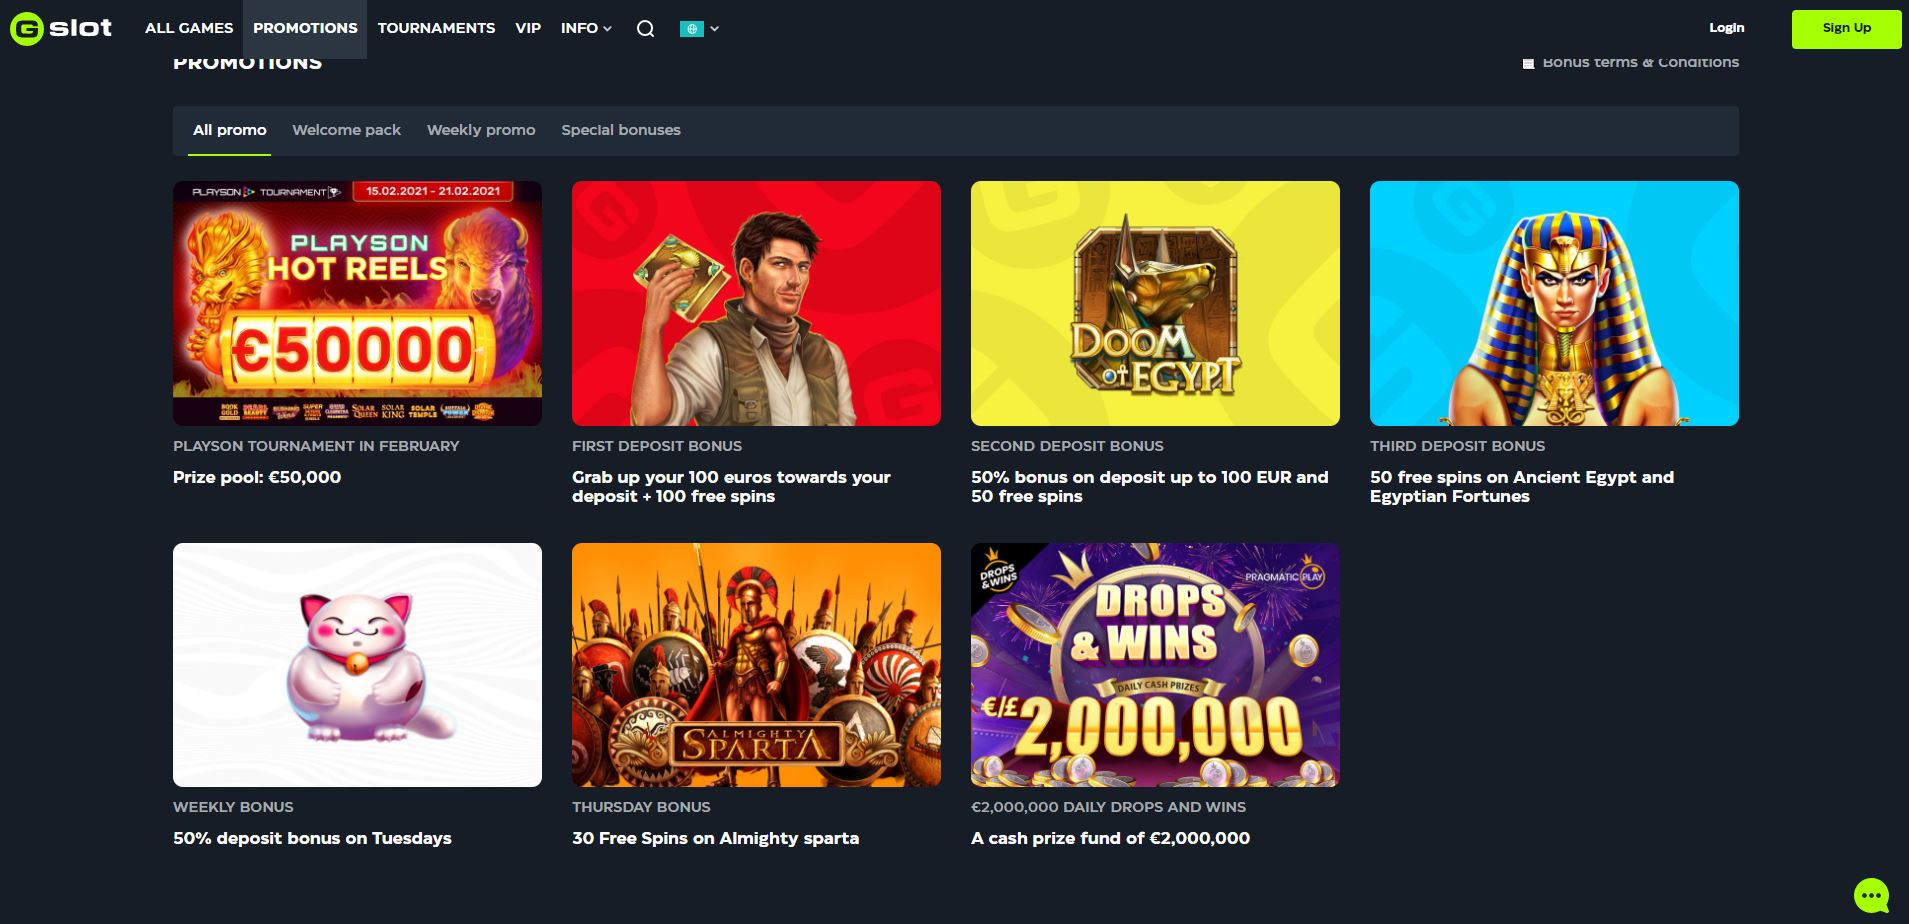 Gslot Casino Promotions Screenshot